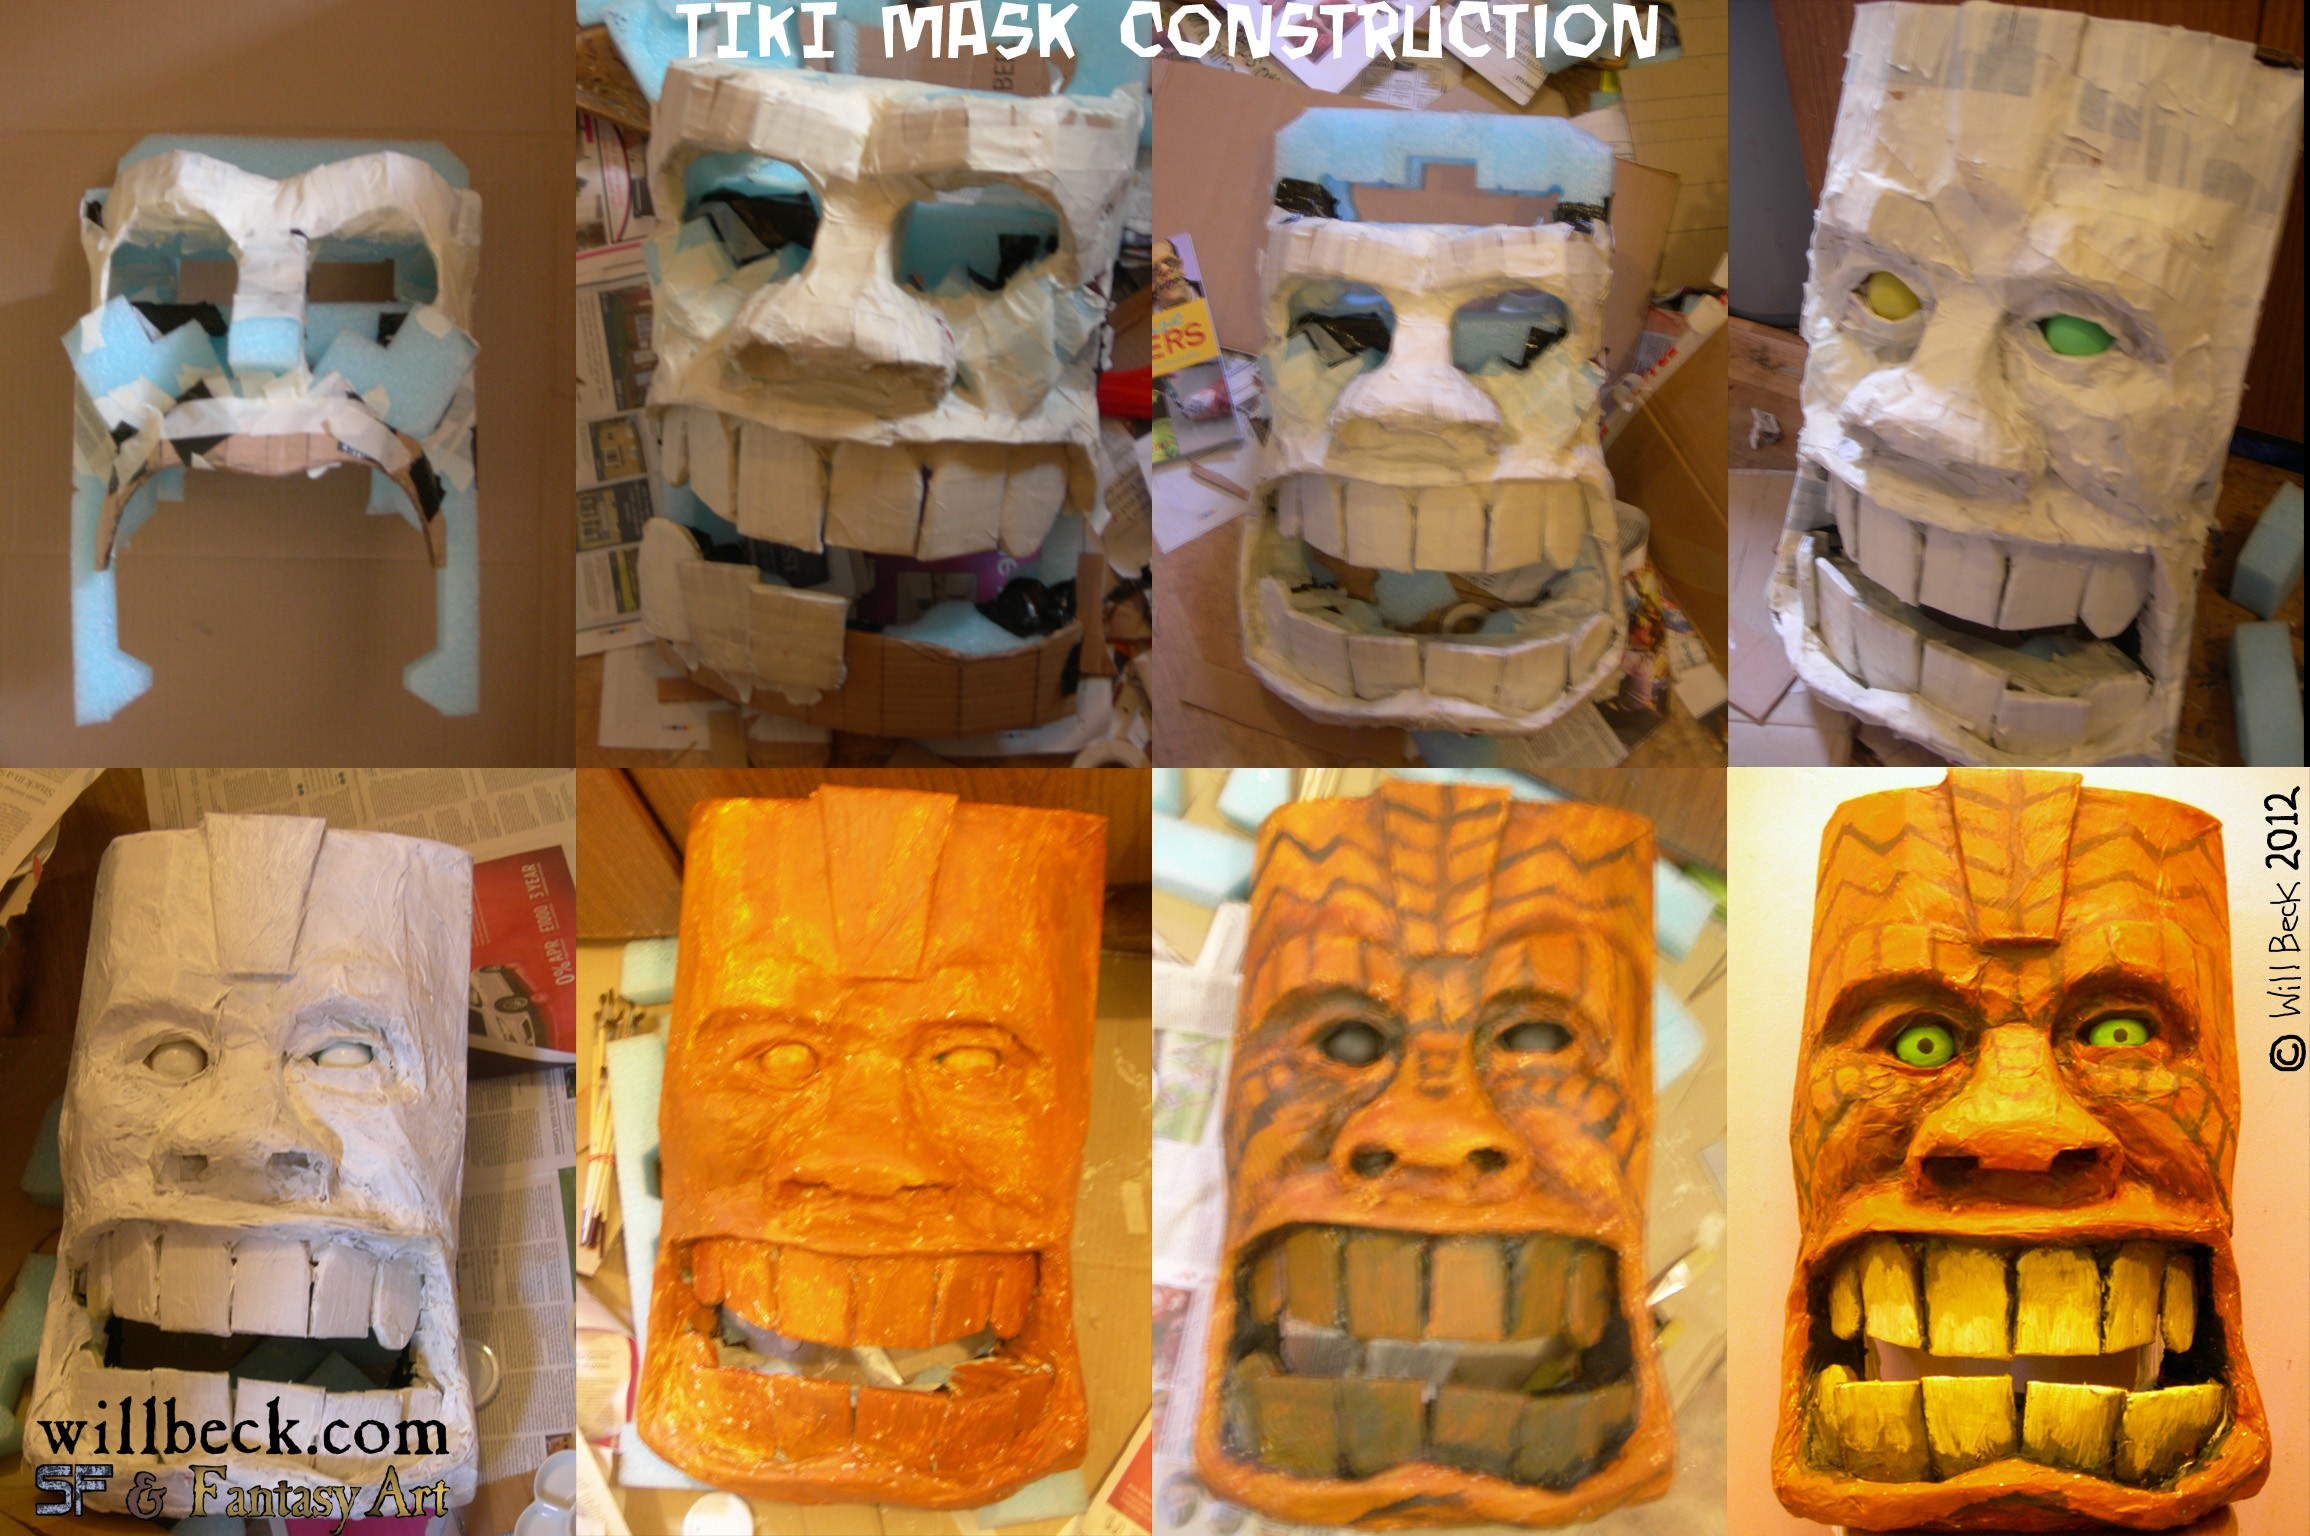 Tiki mask construction